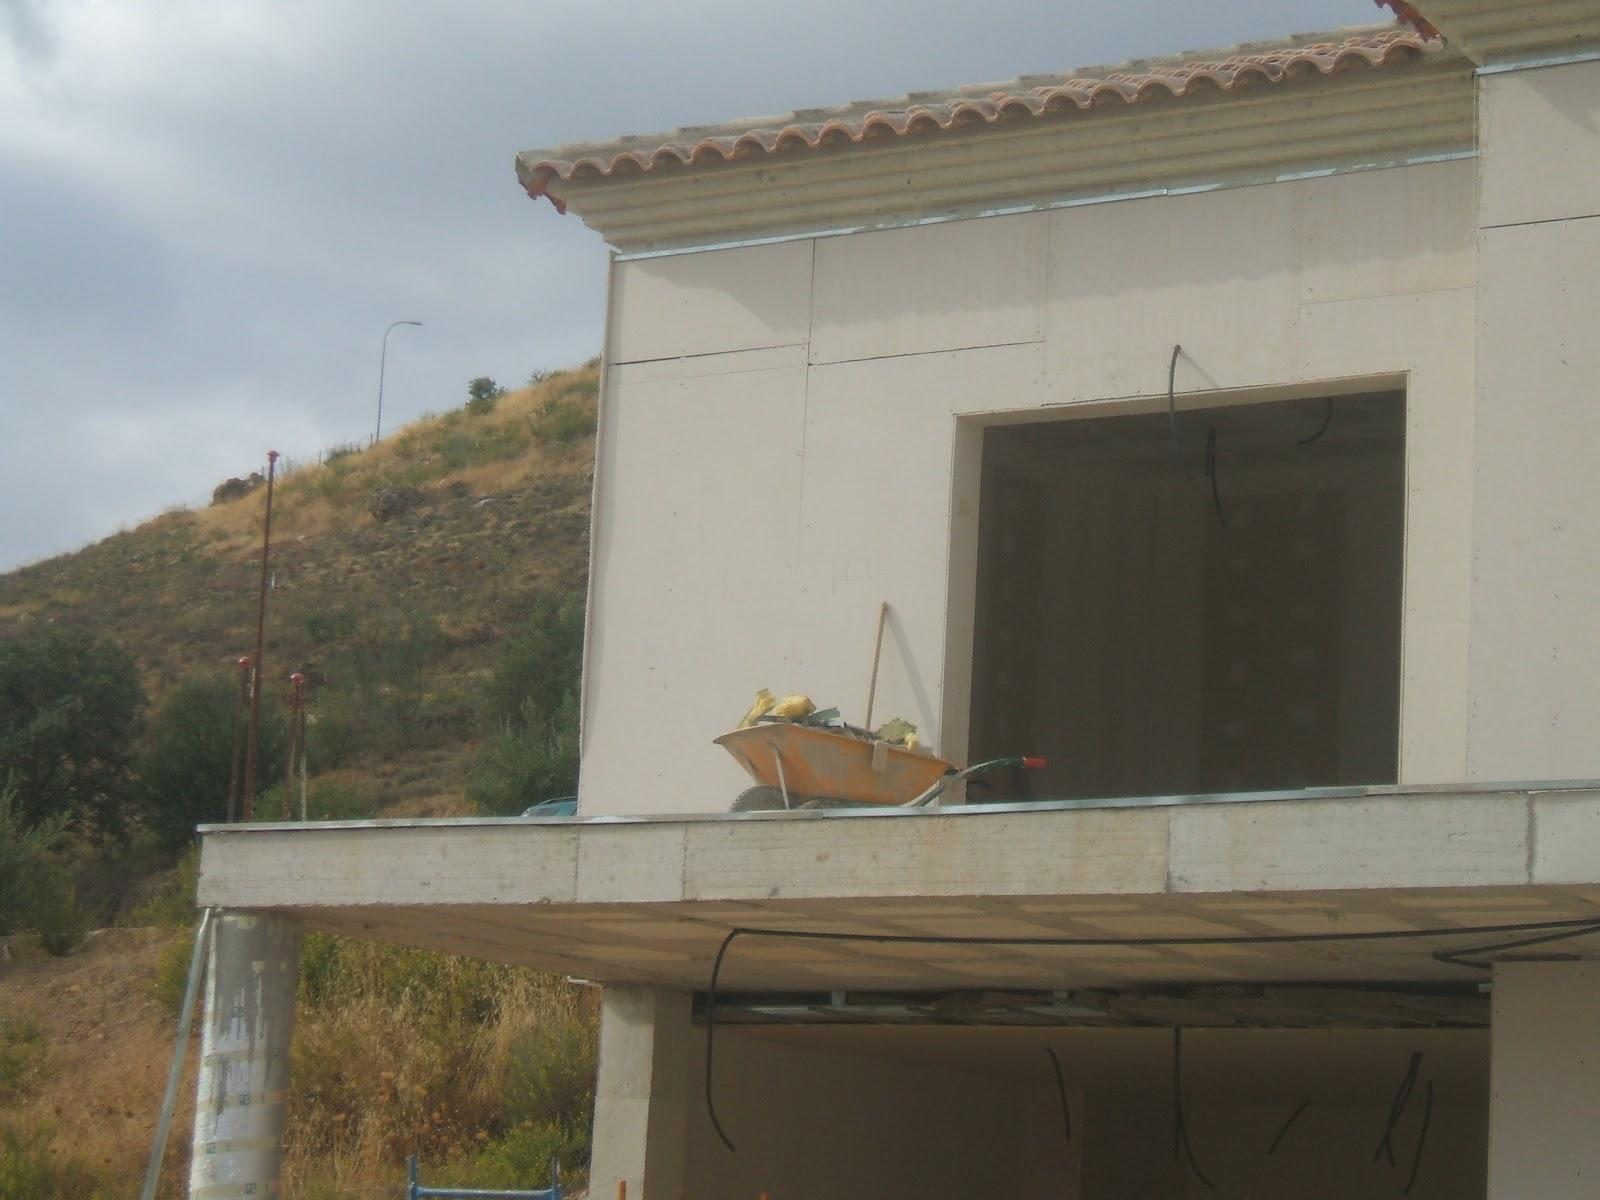 Aislamientos escobar tlf 637849242 casa pladur antequera - Muebles sanchez antequera ...